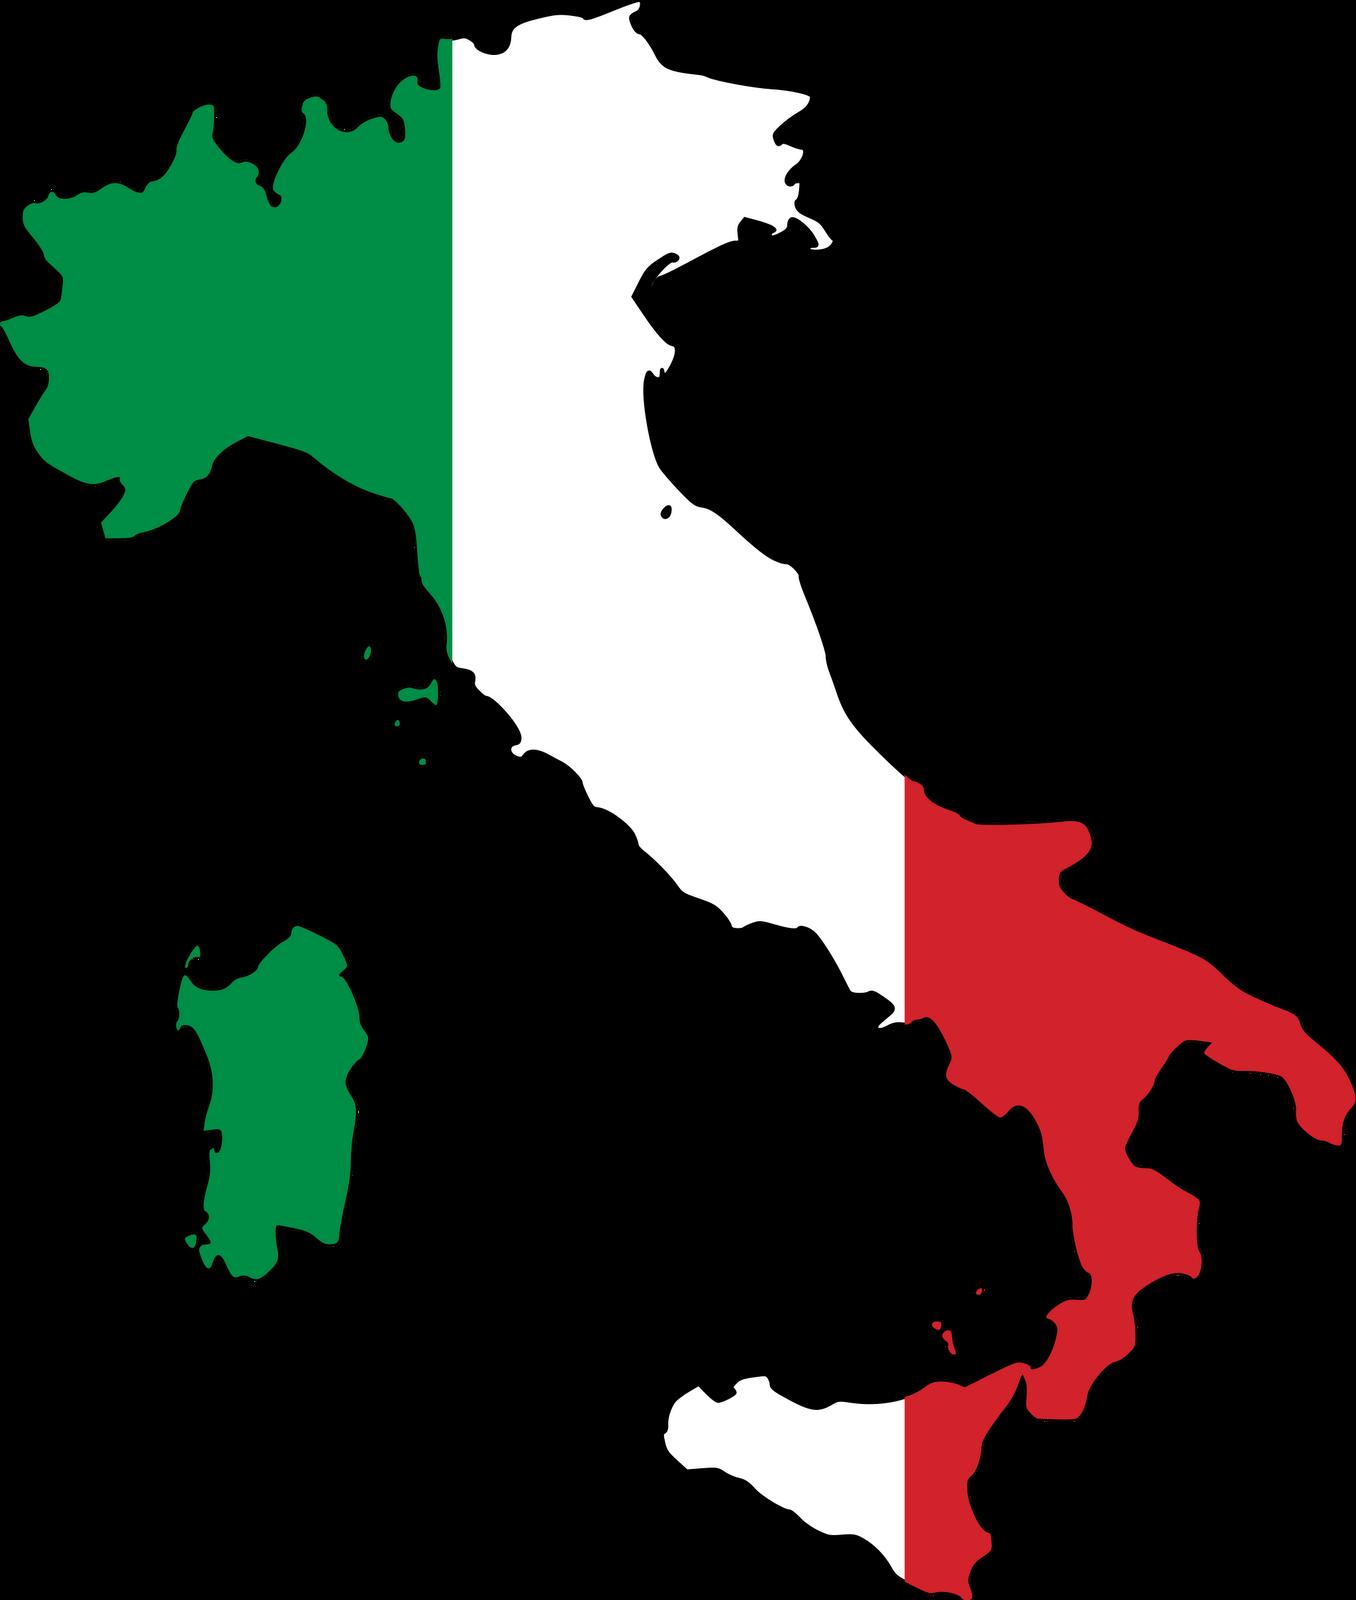 867c1472e47f Italian Flag Clip Art | italy flag italy flag map italy flag icon ...